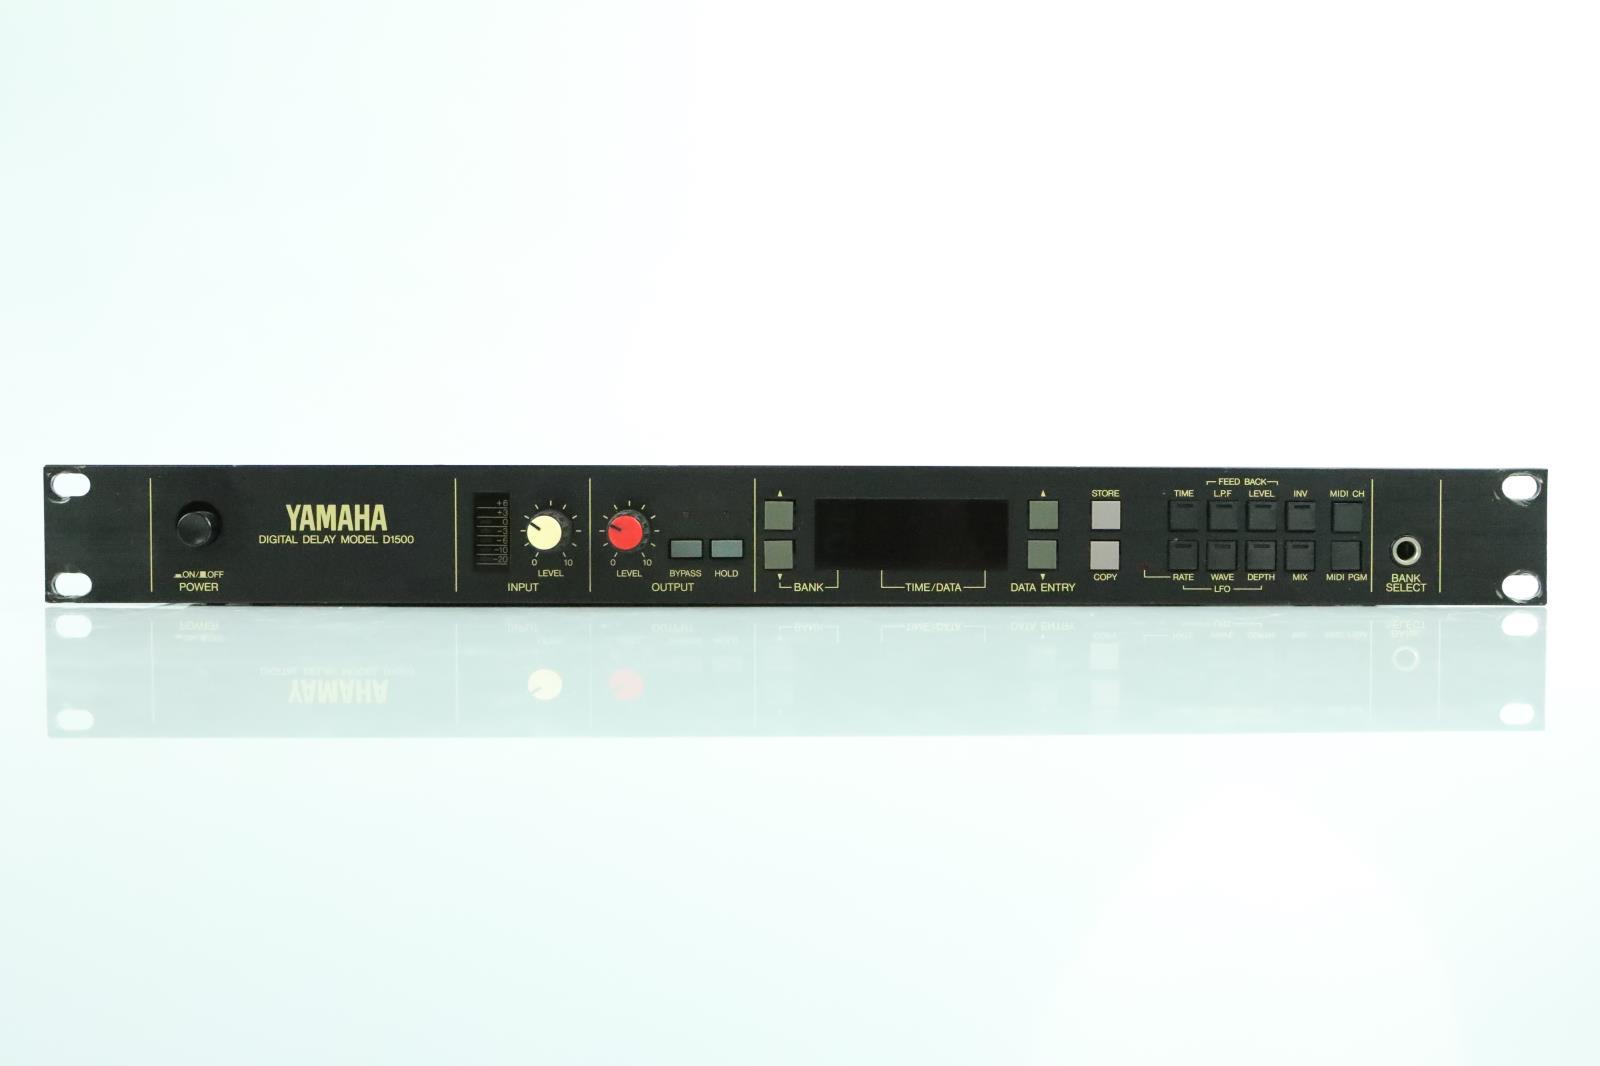 Yamaha D1500 Digital Delay Effect Processor #33920